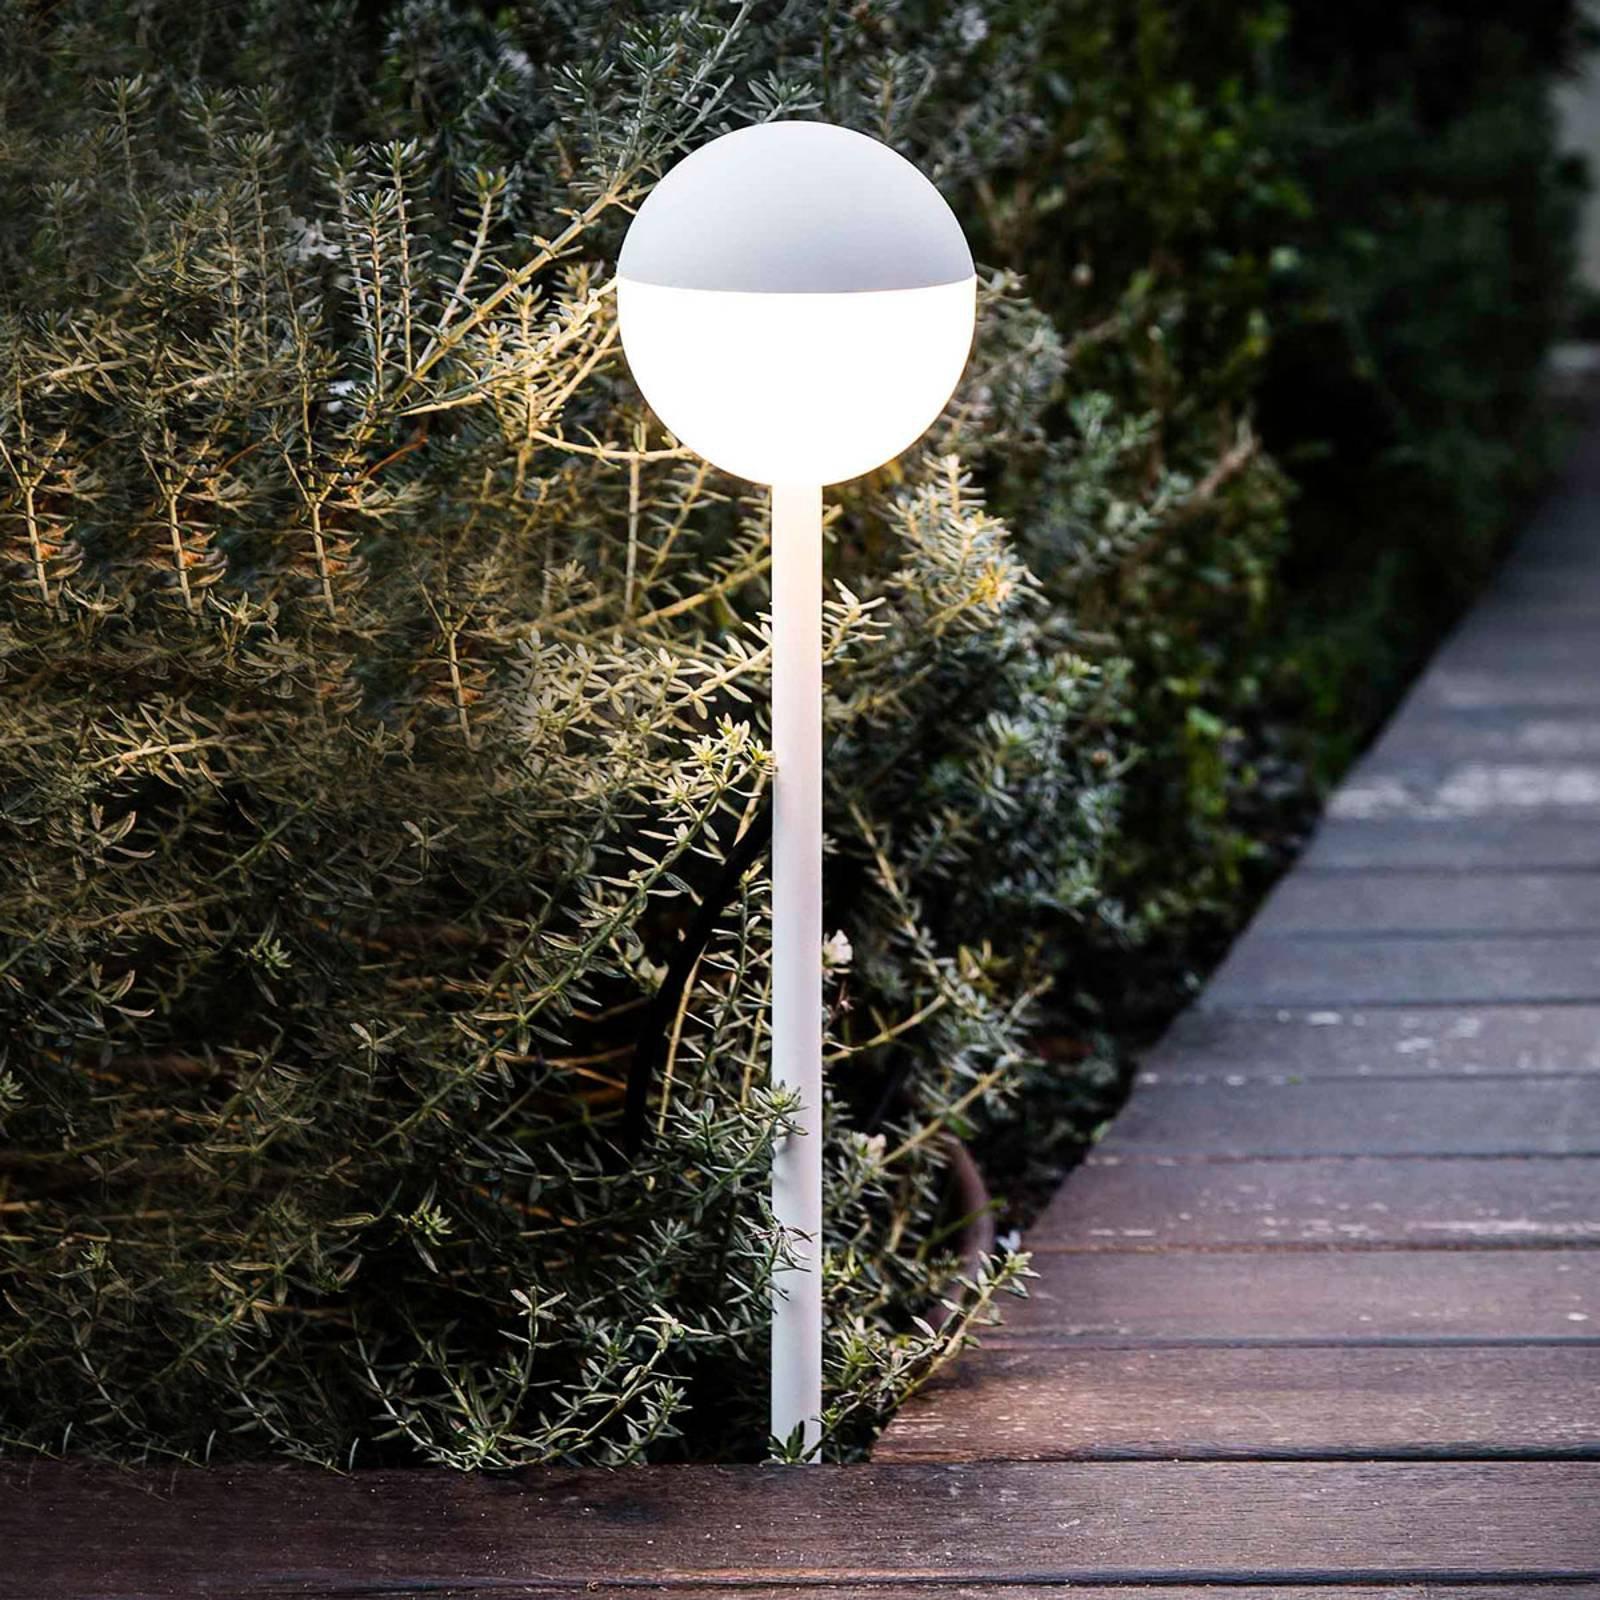 LED-gatelampe Piccola med jordspyd, hvit